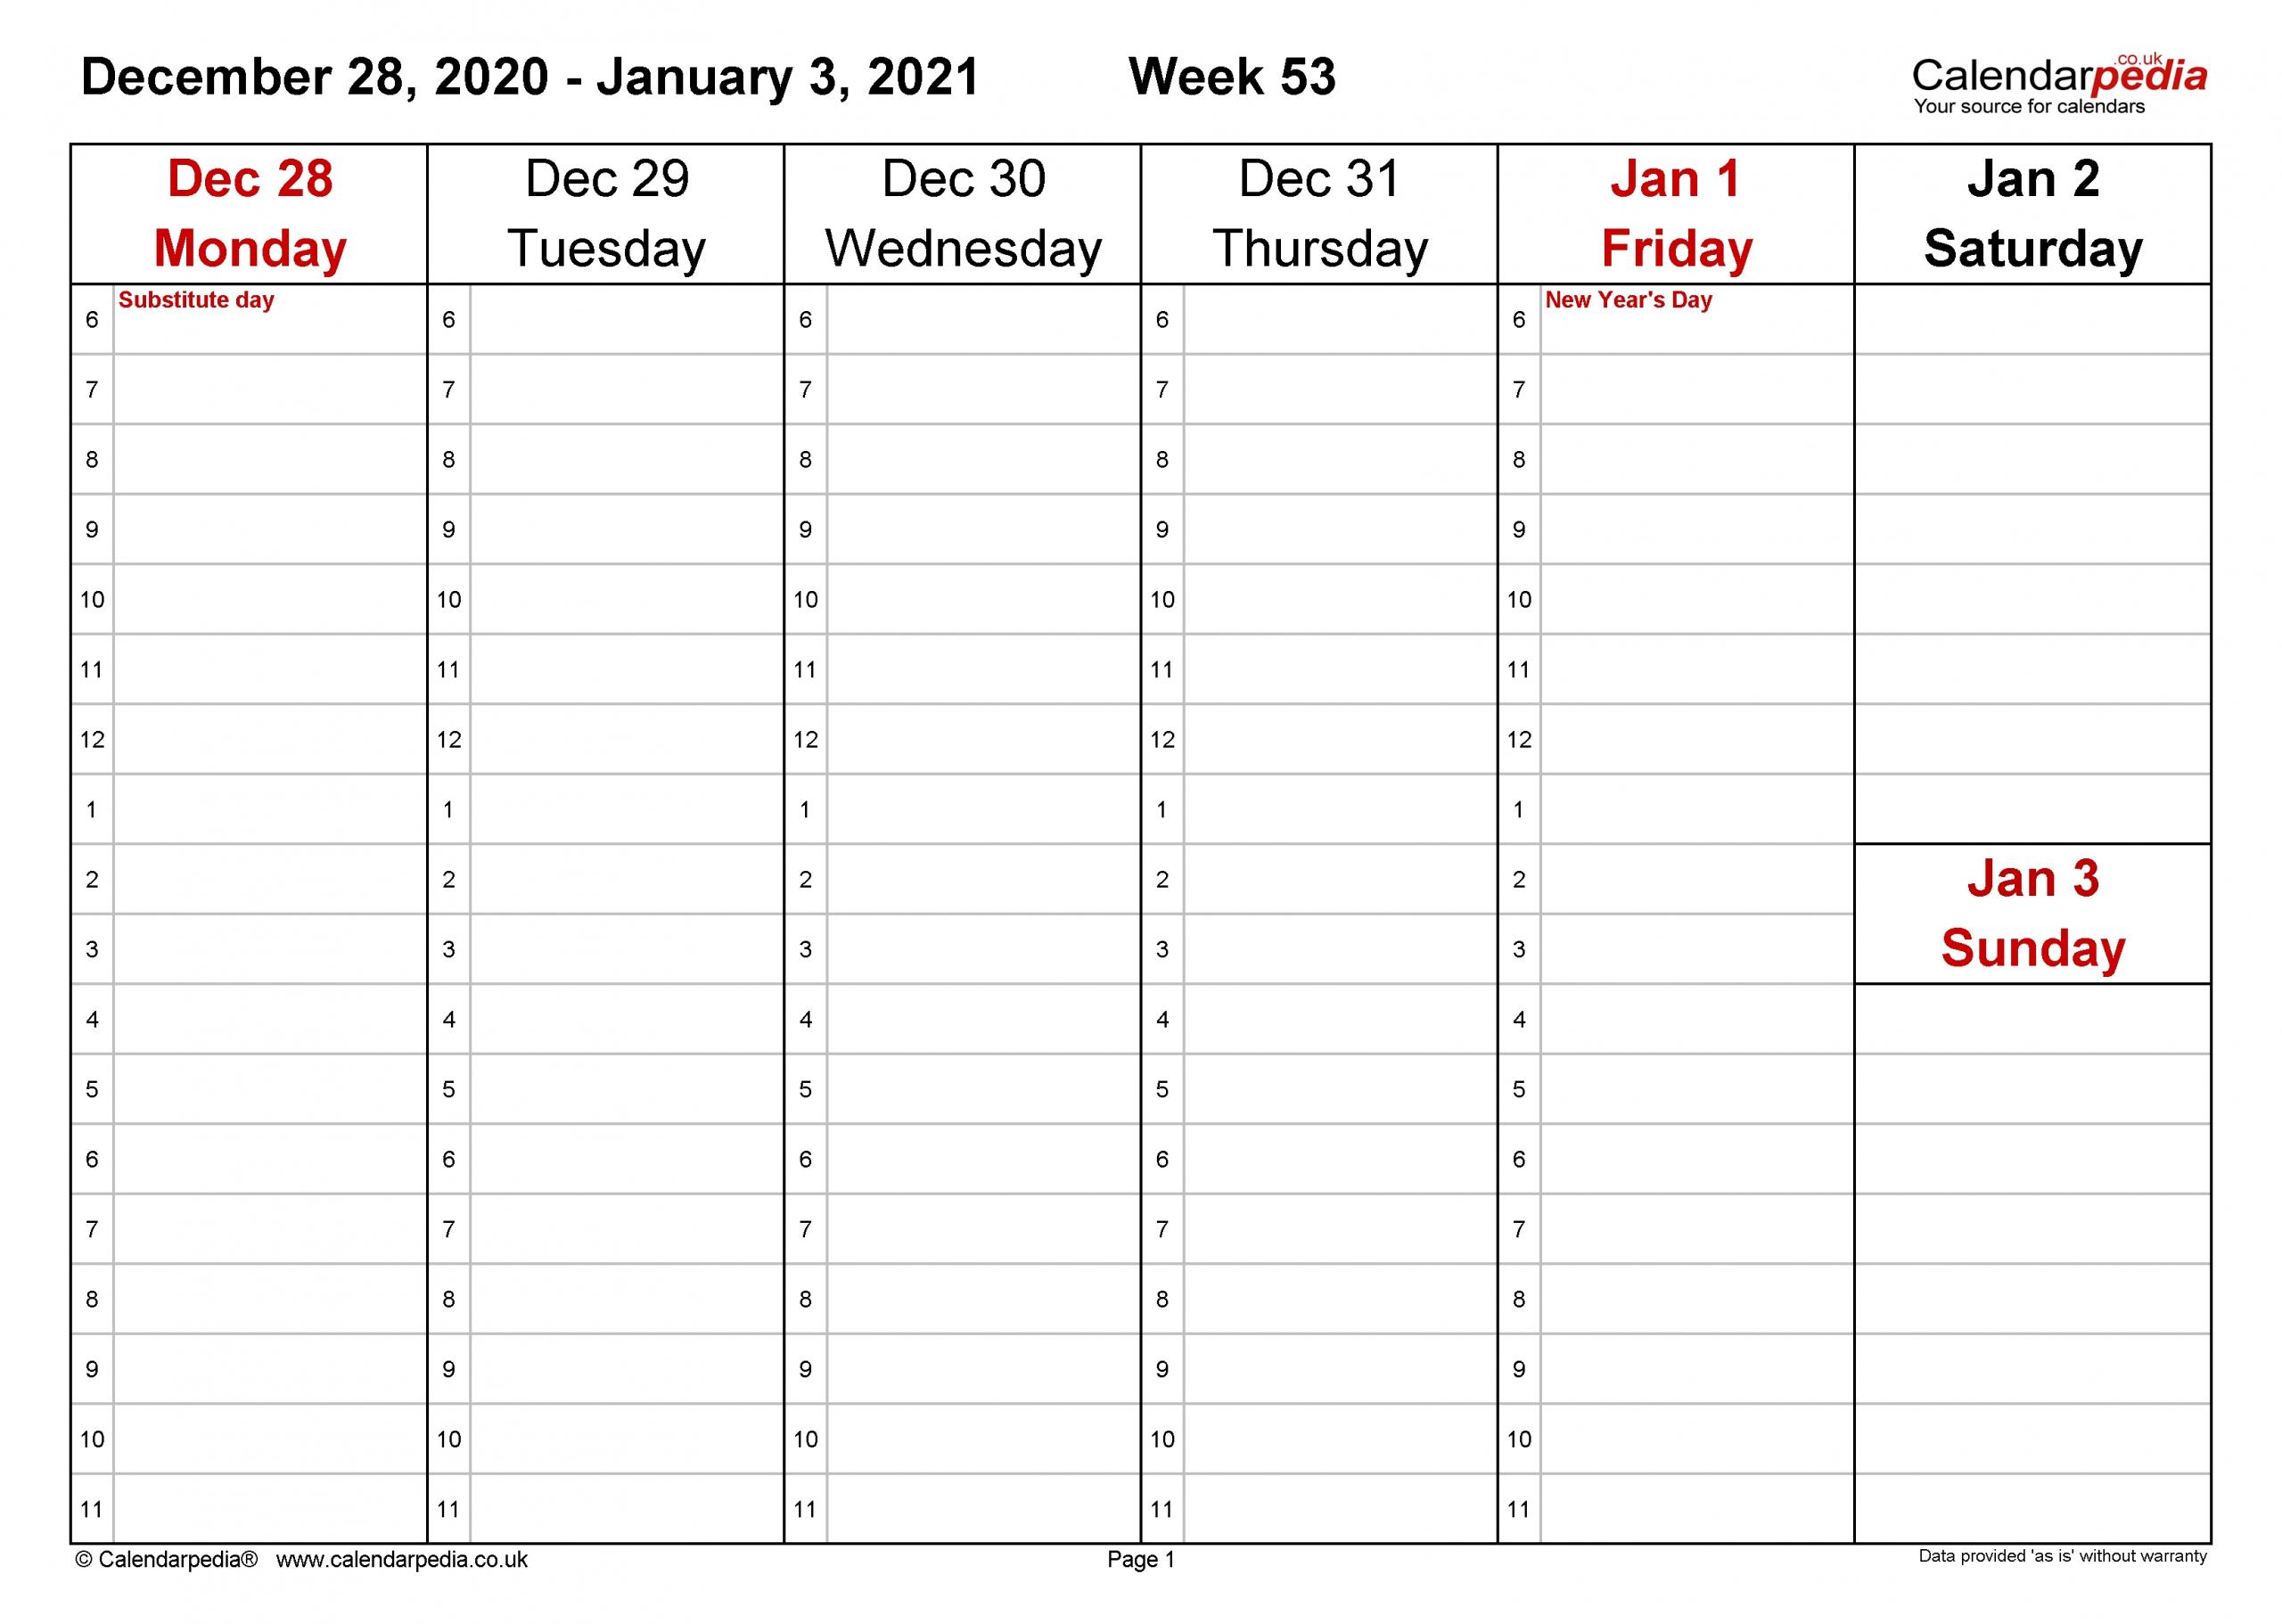 2021 Calnder By Week No Excel | Calendar Template Printable for 2021 Excel Printable Calendars